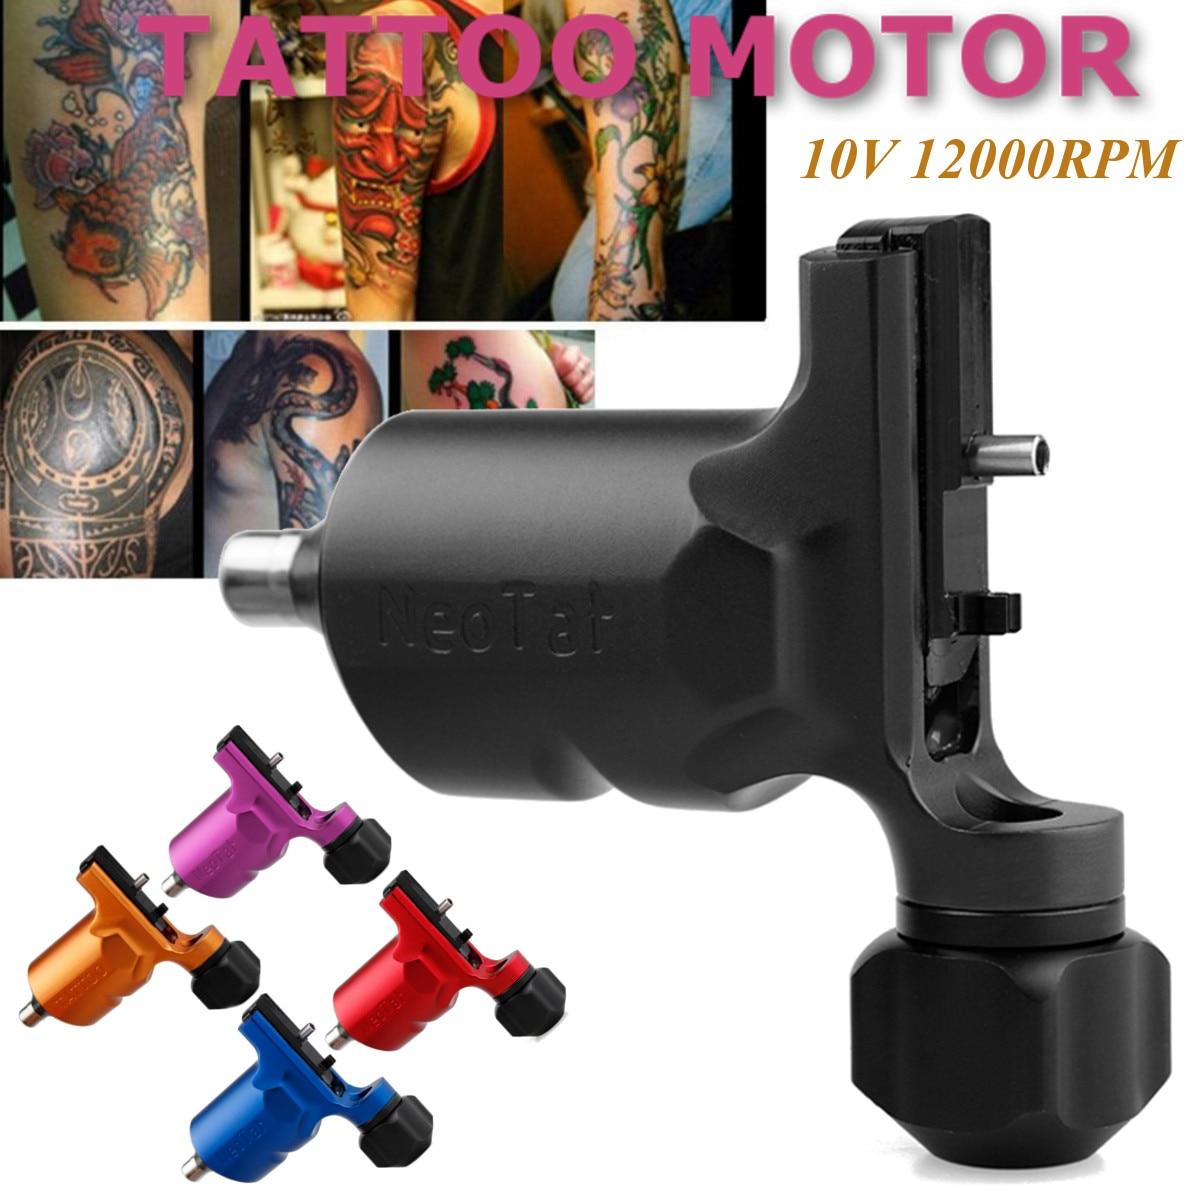 Adjustable Stroke Direct Drive Rotary Tattoo Machine For Shader Liner Tattoo Motor Gun rotary tattoo machine parts